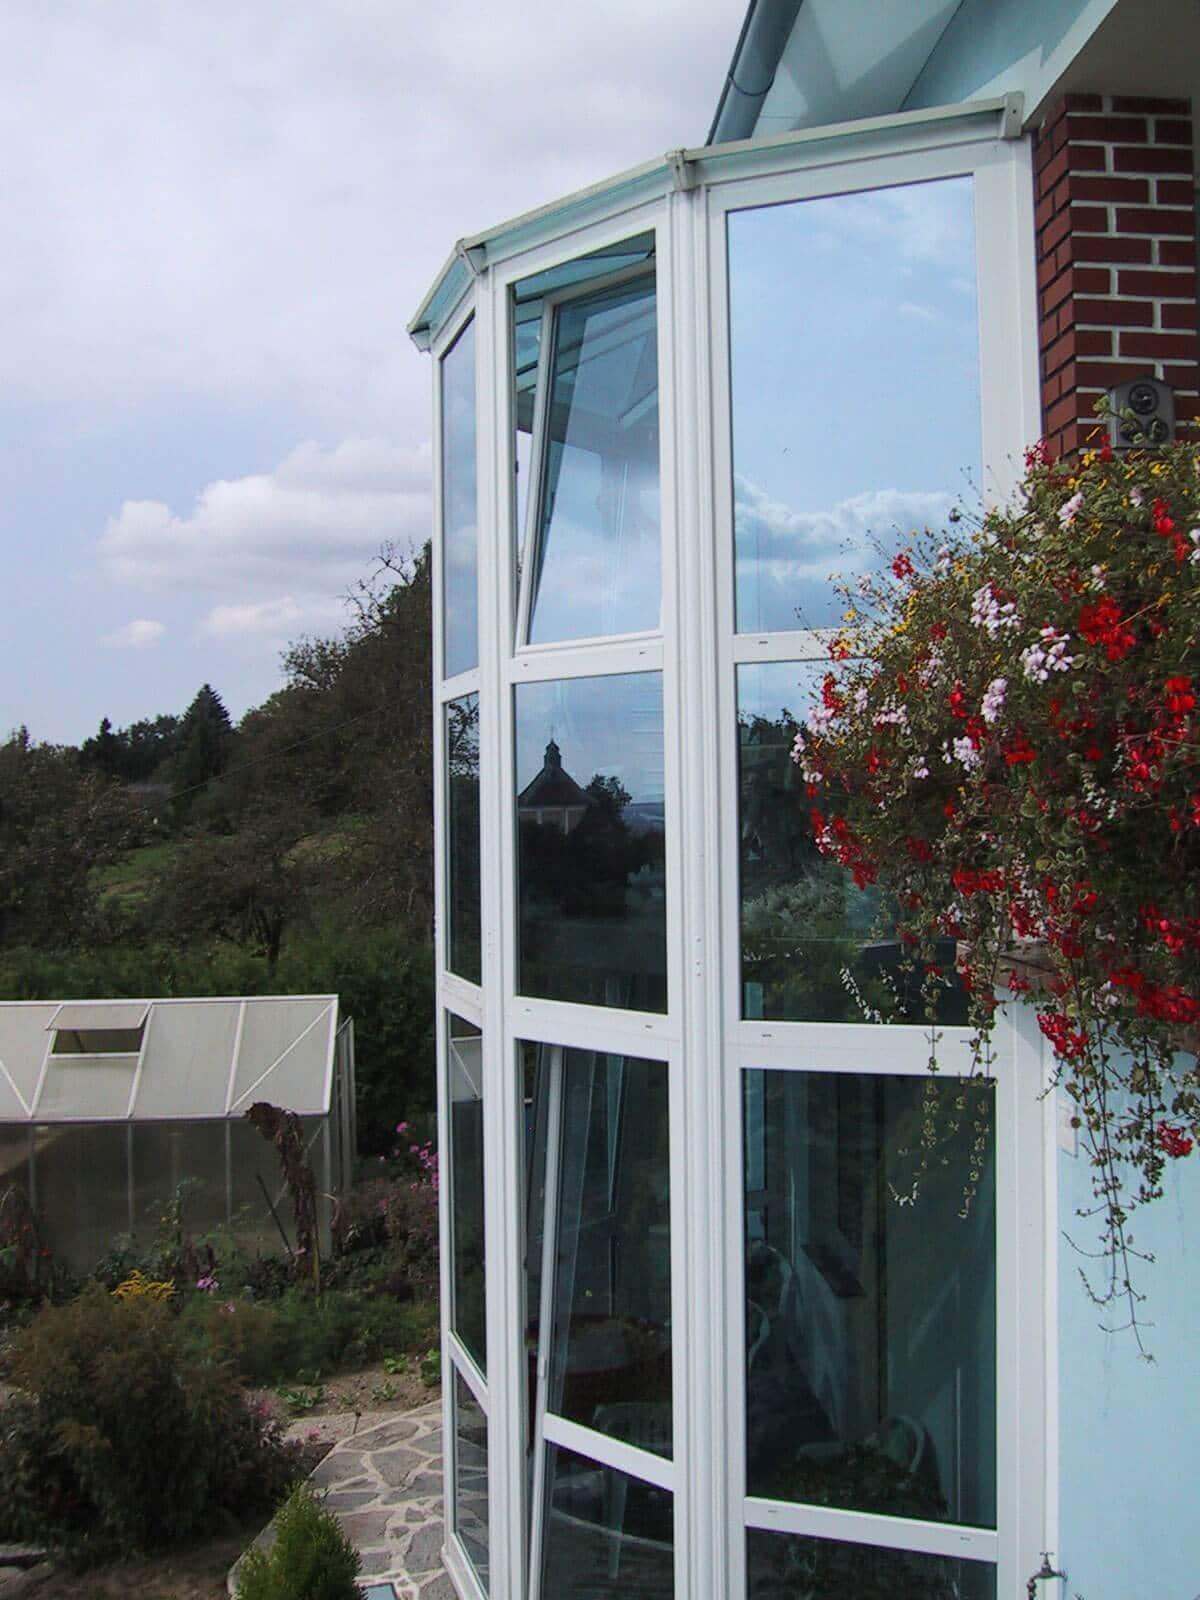 Balkonverkleidung aus Glas zum Falten Fenster Schmidinger